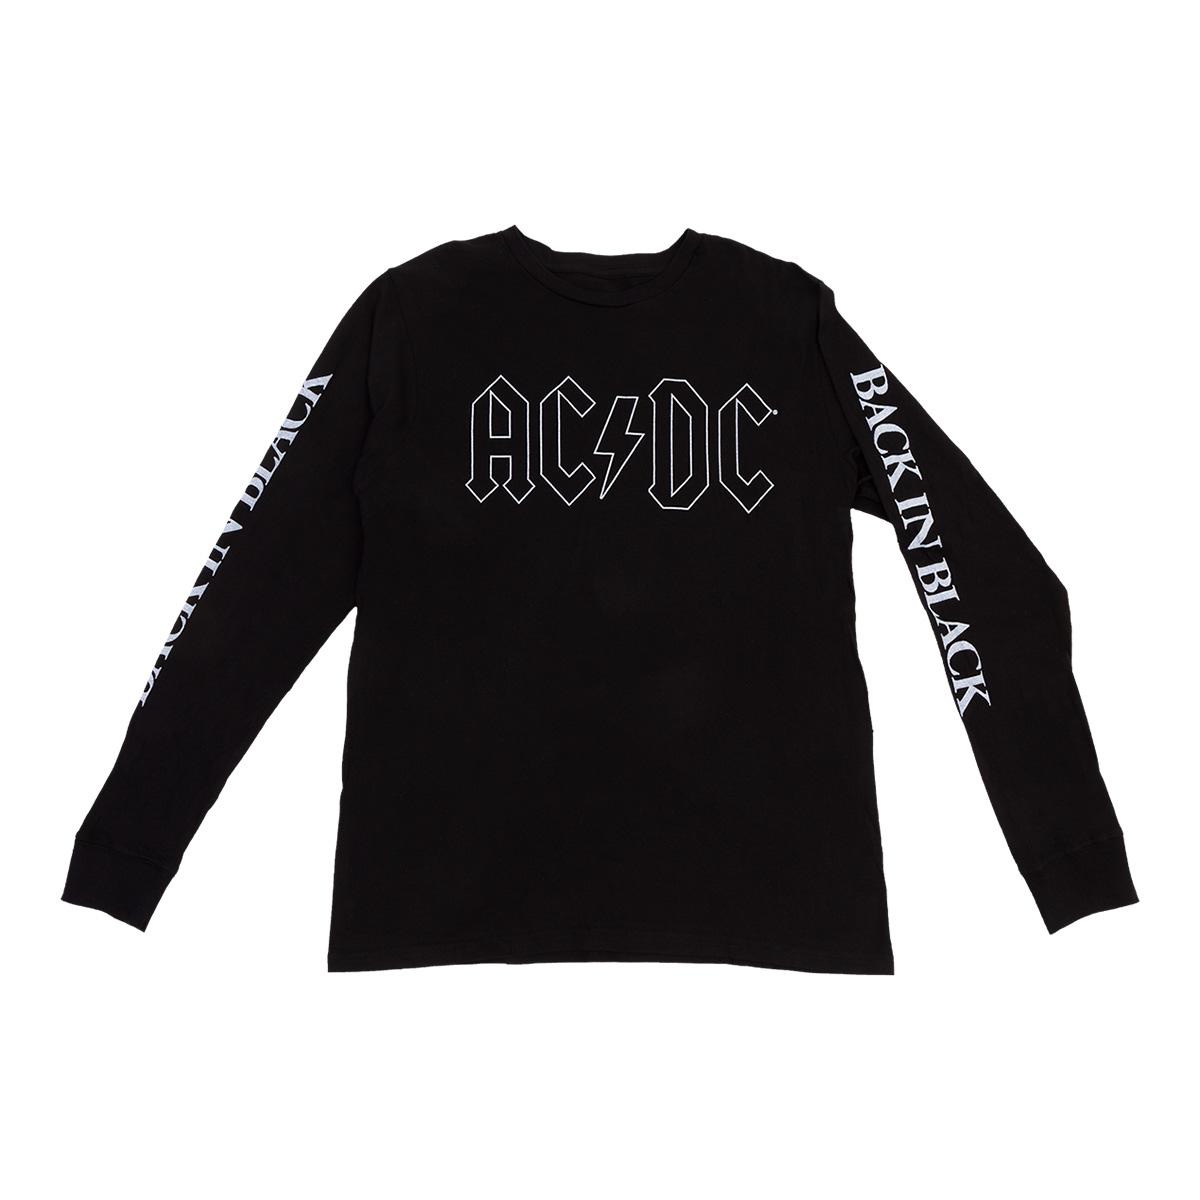 AC/DC Back in Black Longsleeve Tee